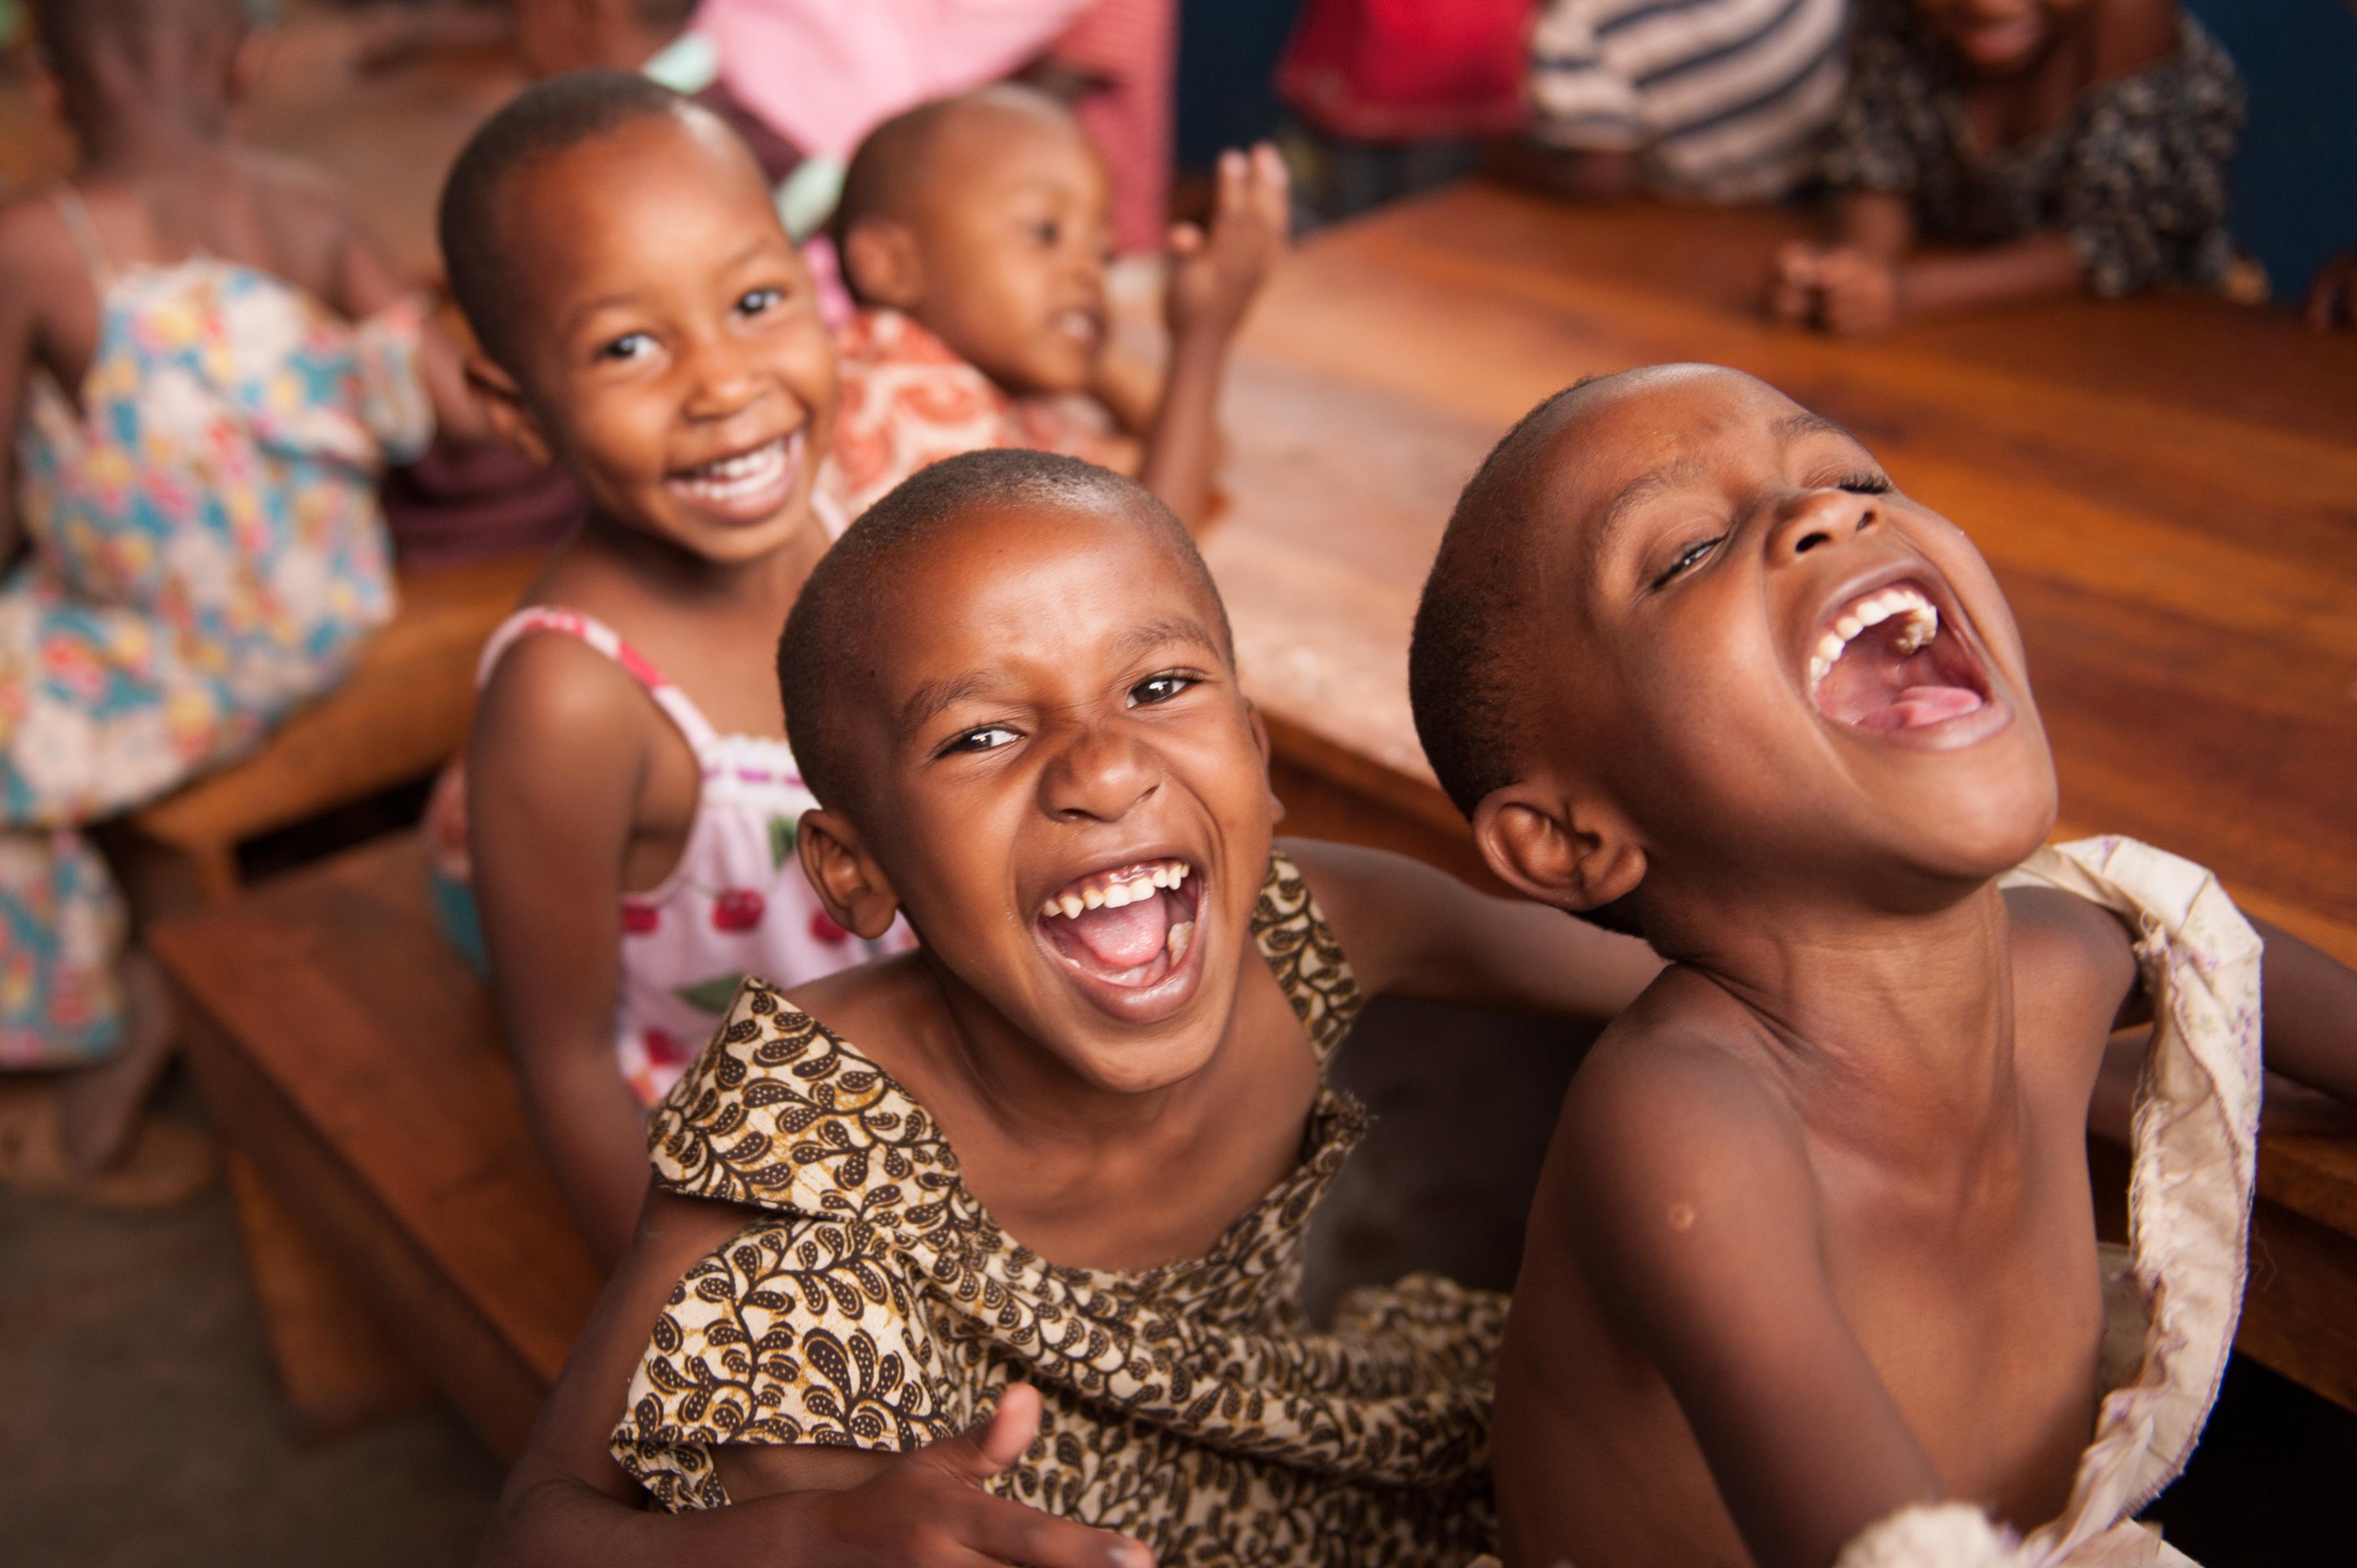 fli-laughing-children